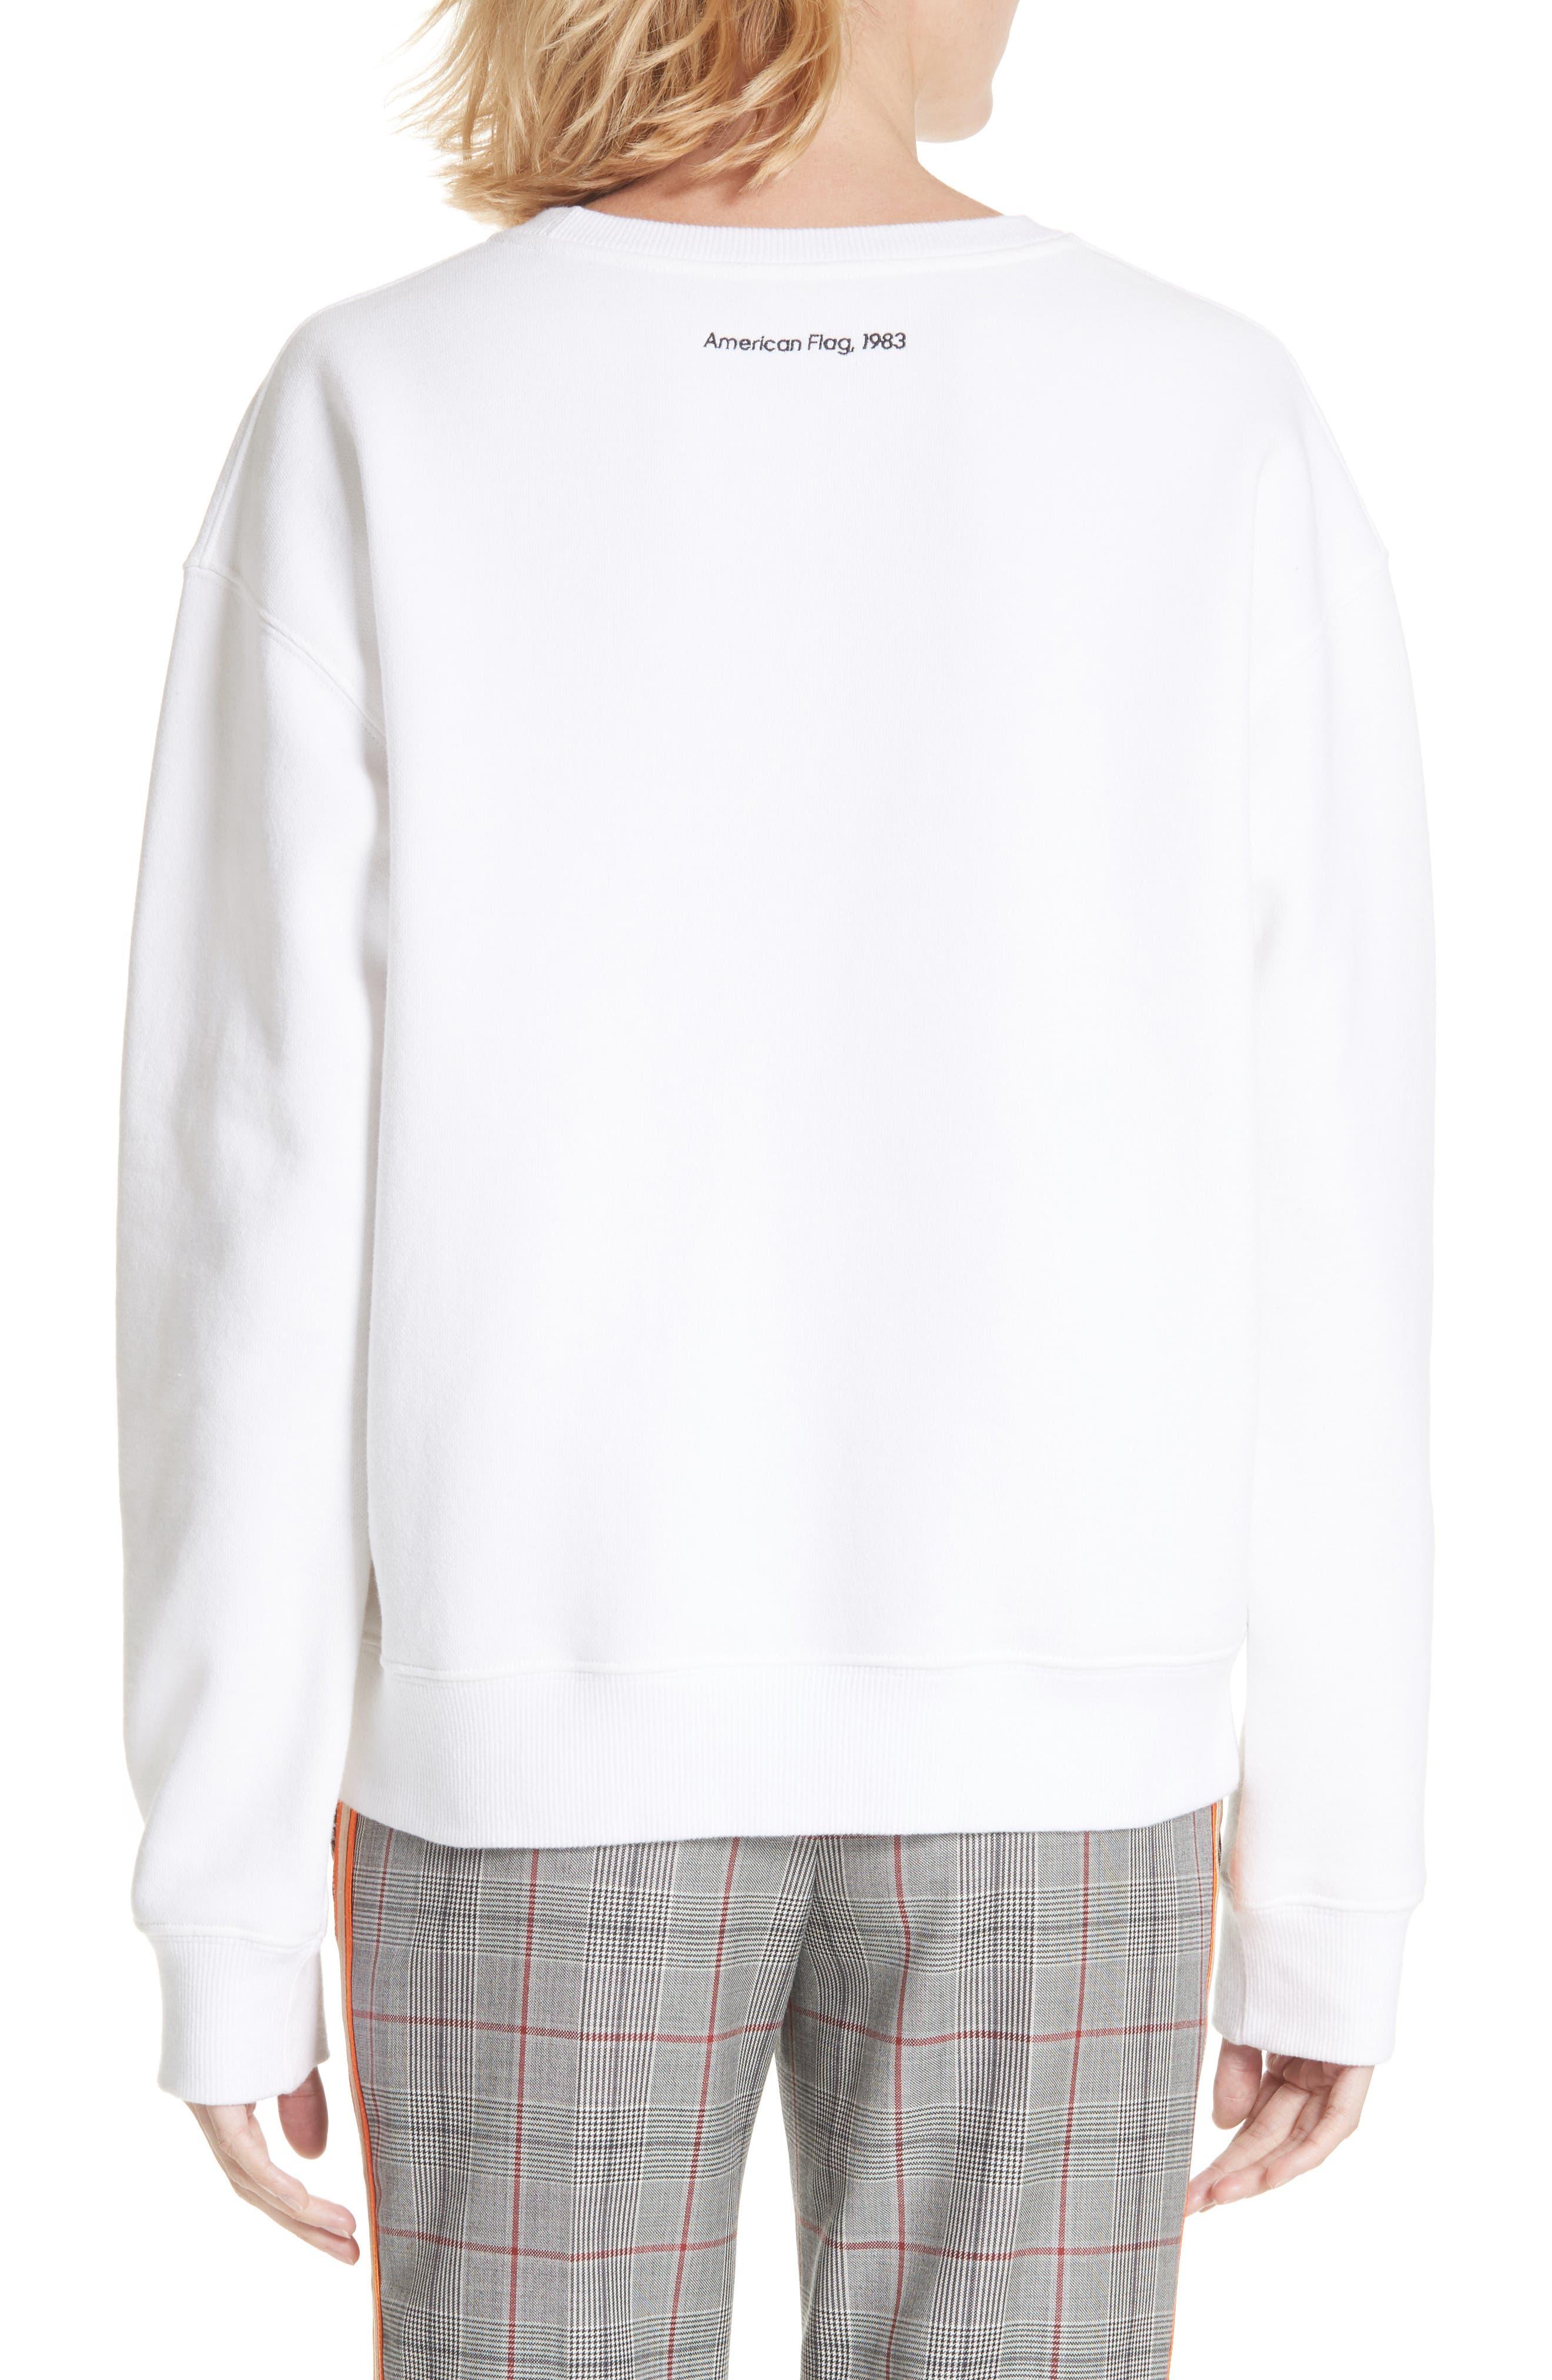 x Andy Warhol Foundation American Flag Graphic Sweatshirt,                             Alternate thumbnail 2, color,                             WHITE BLACK